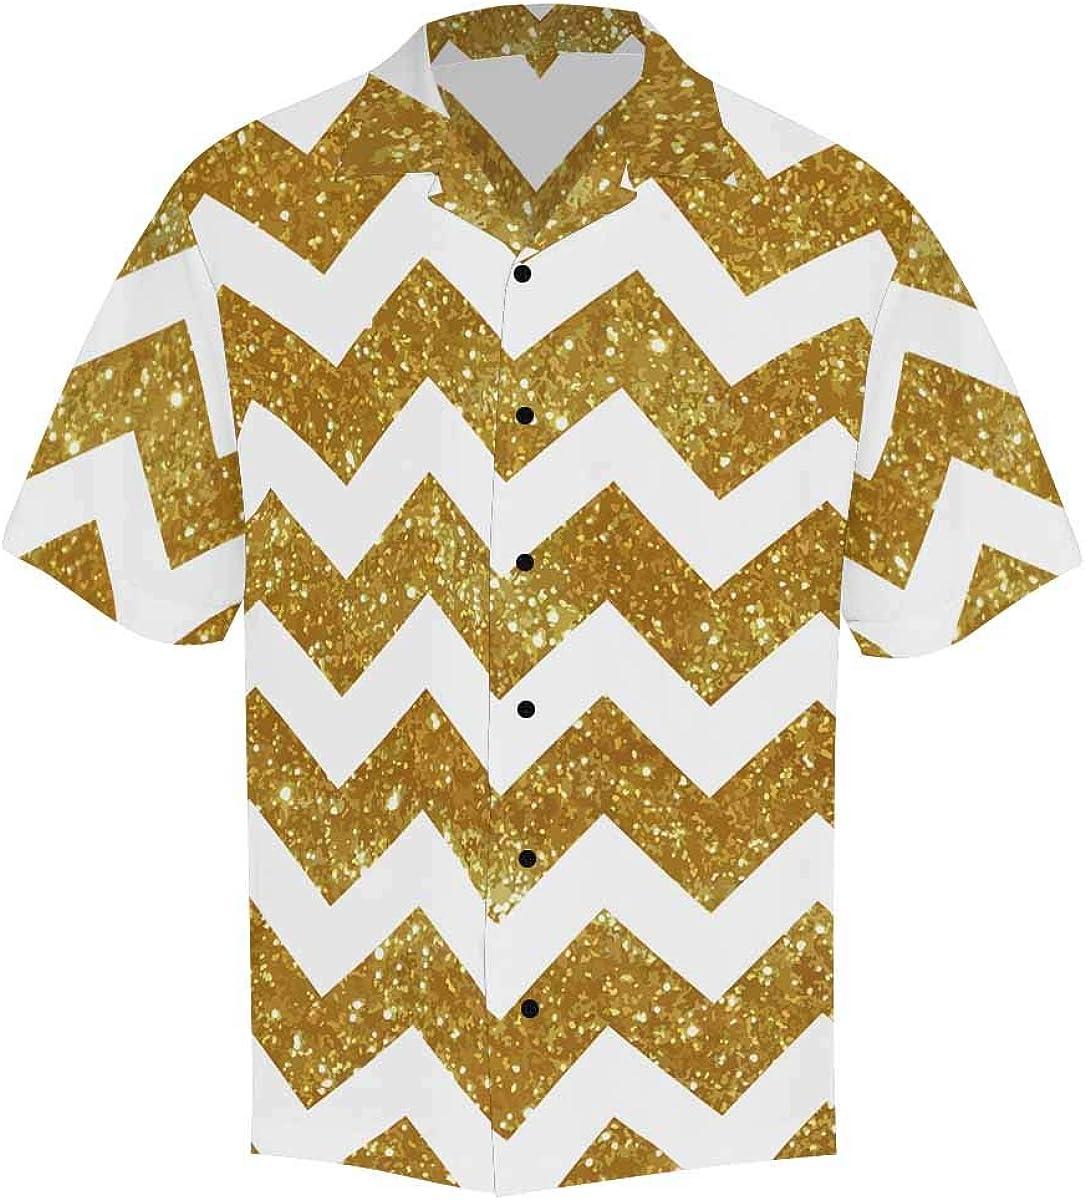 InterestPrint Men's Casual Button Down Short Sleeve Geometric Triangle Chervon Hawaiian Shirt (S-5XL)